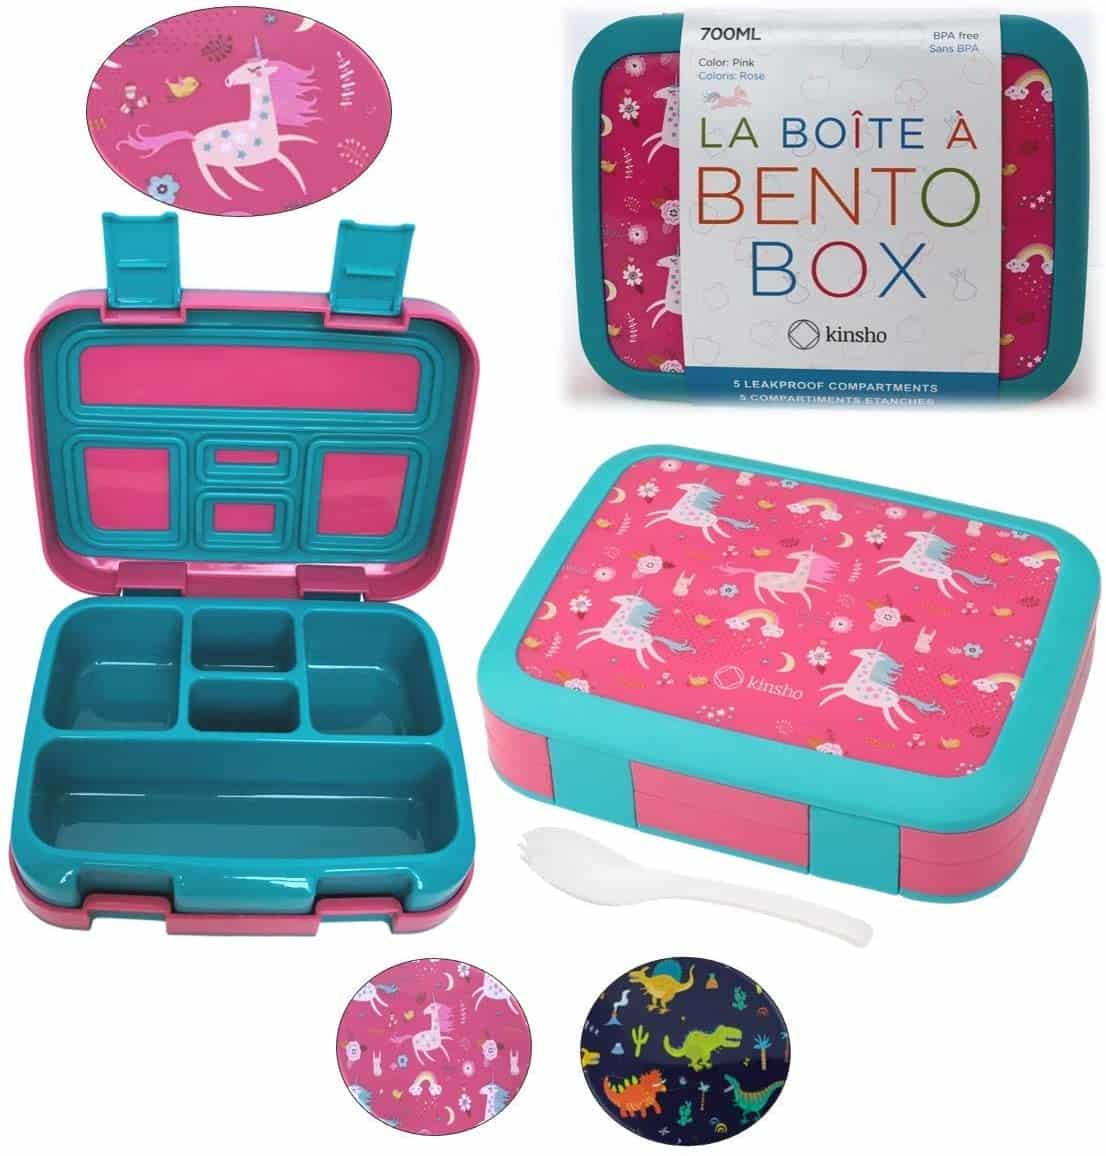 unicorn-gifts-for-girls-bento-box